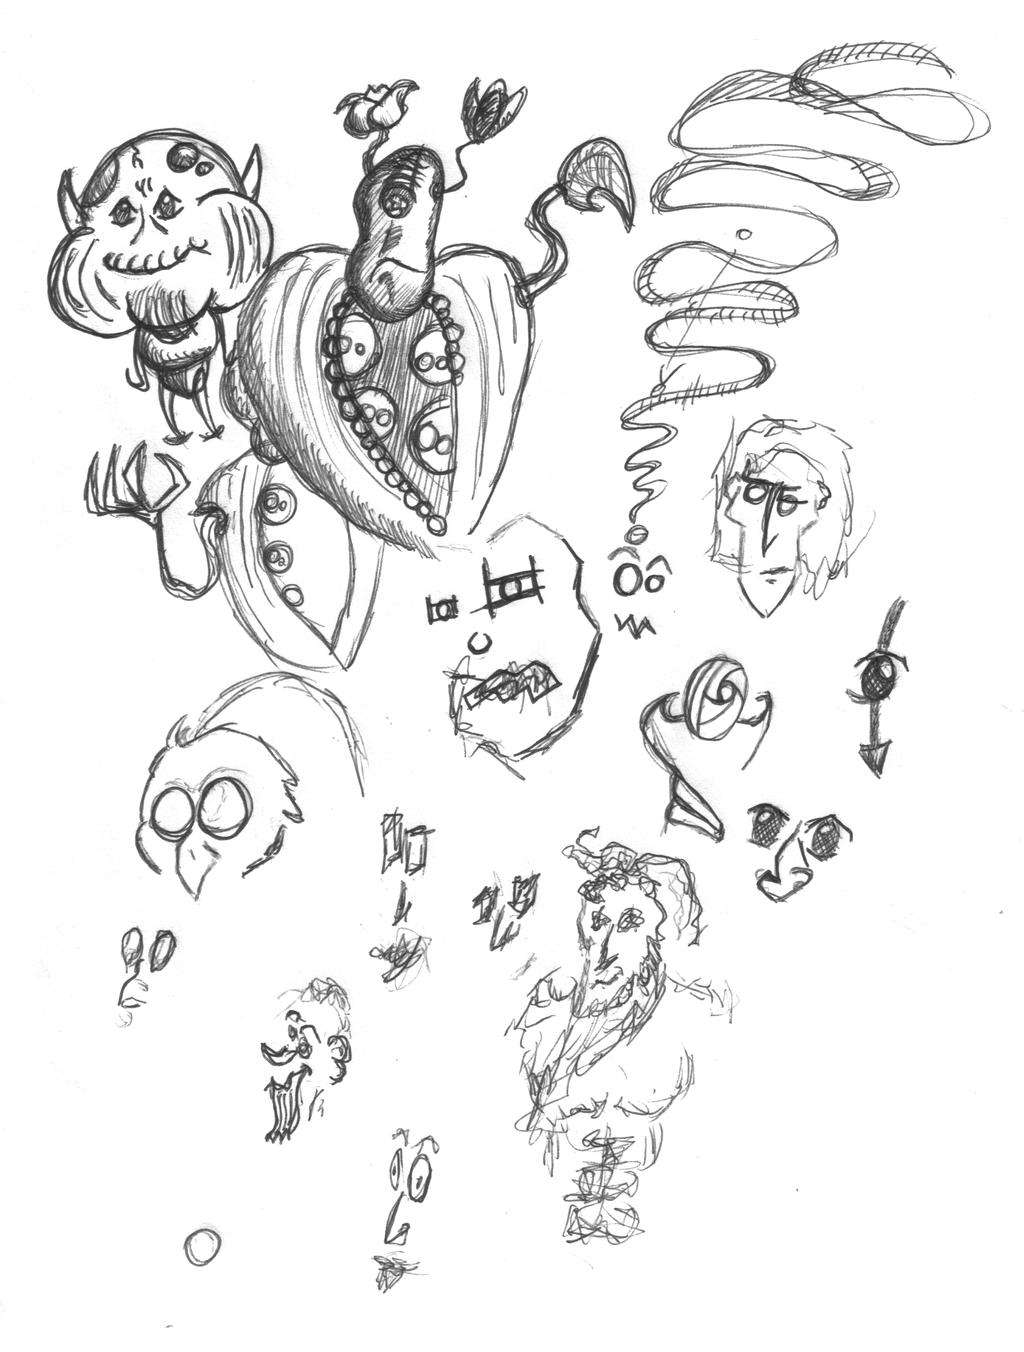 random_scribbles_by_milleniumcount-d7s6j